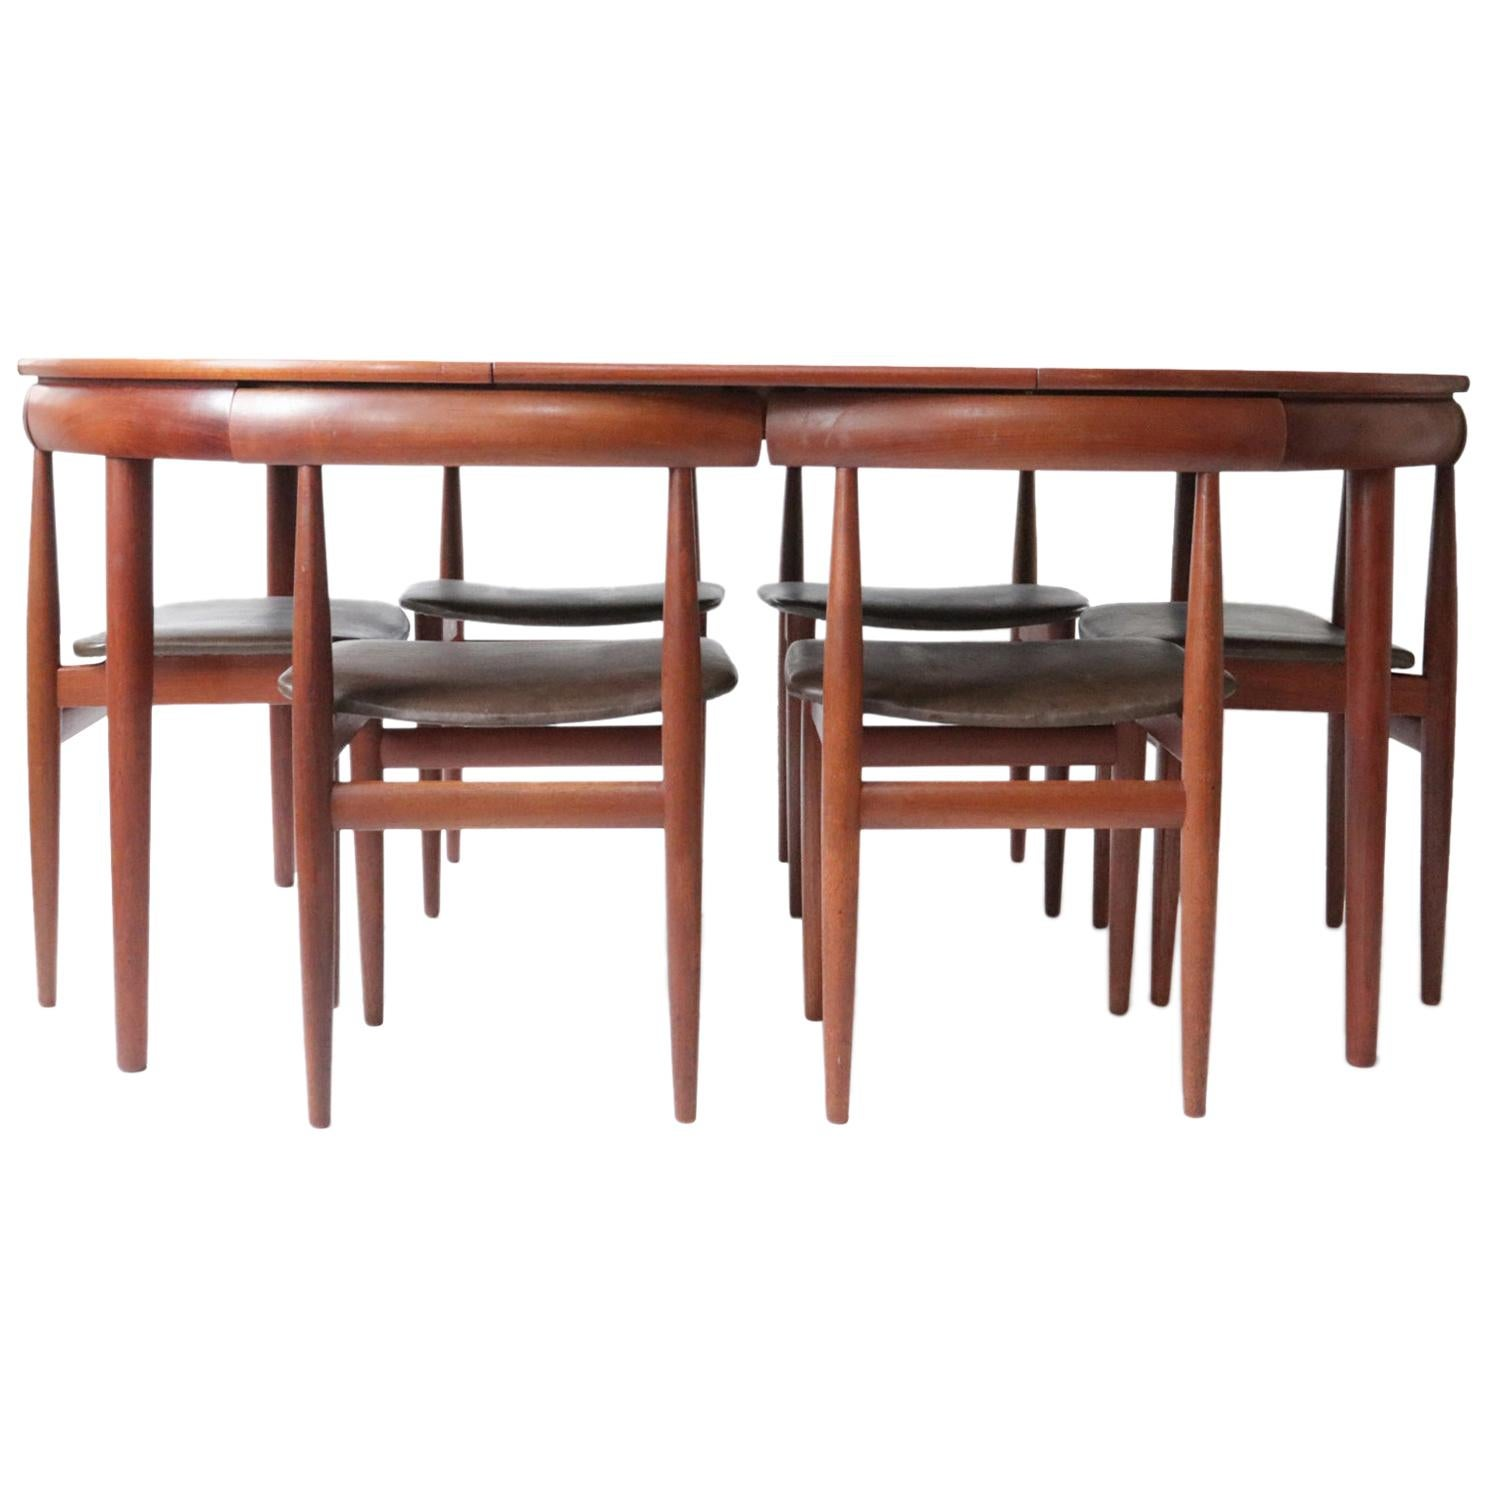 Rare Mid-Century Modern Hans Olsen Frem Rojle Extendable Dining Table 6 Chairs